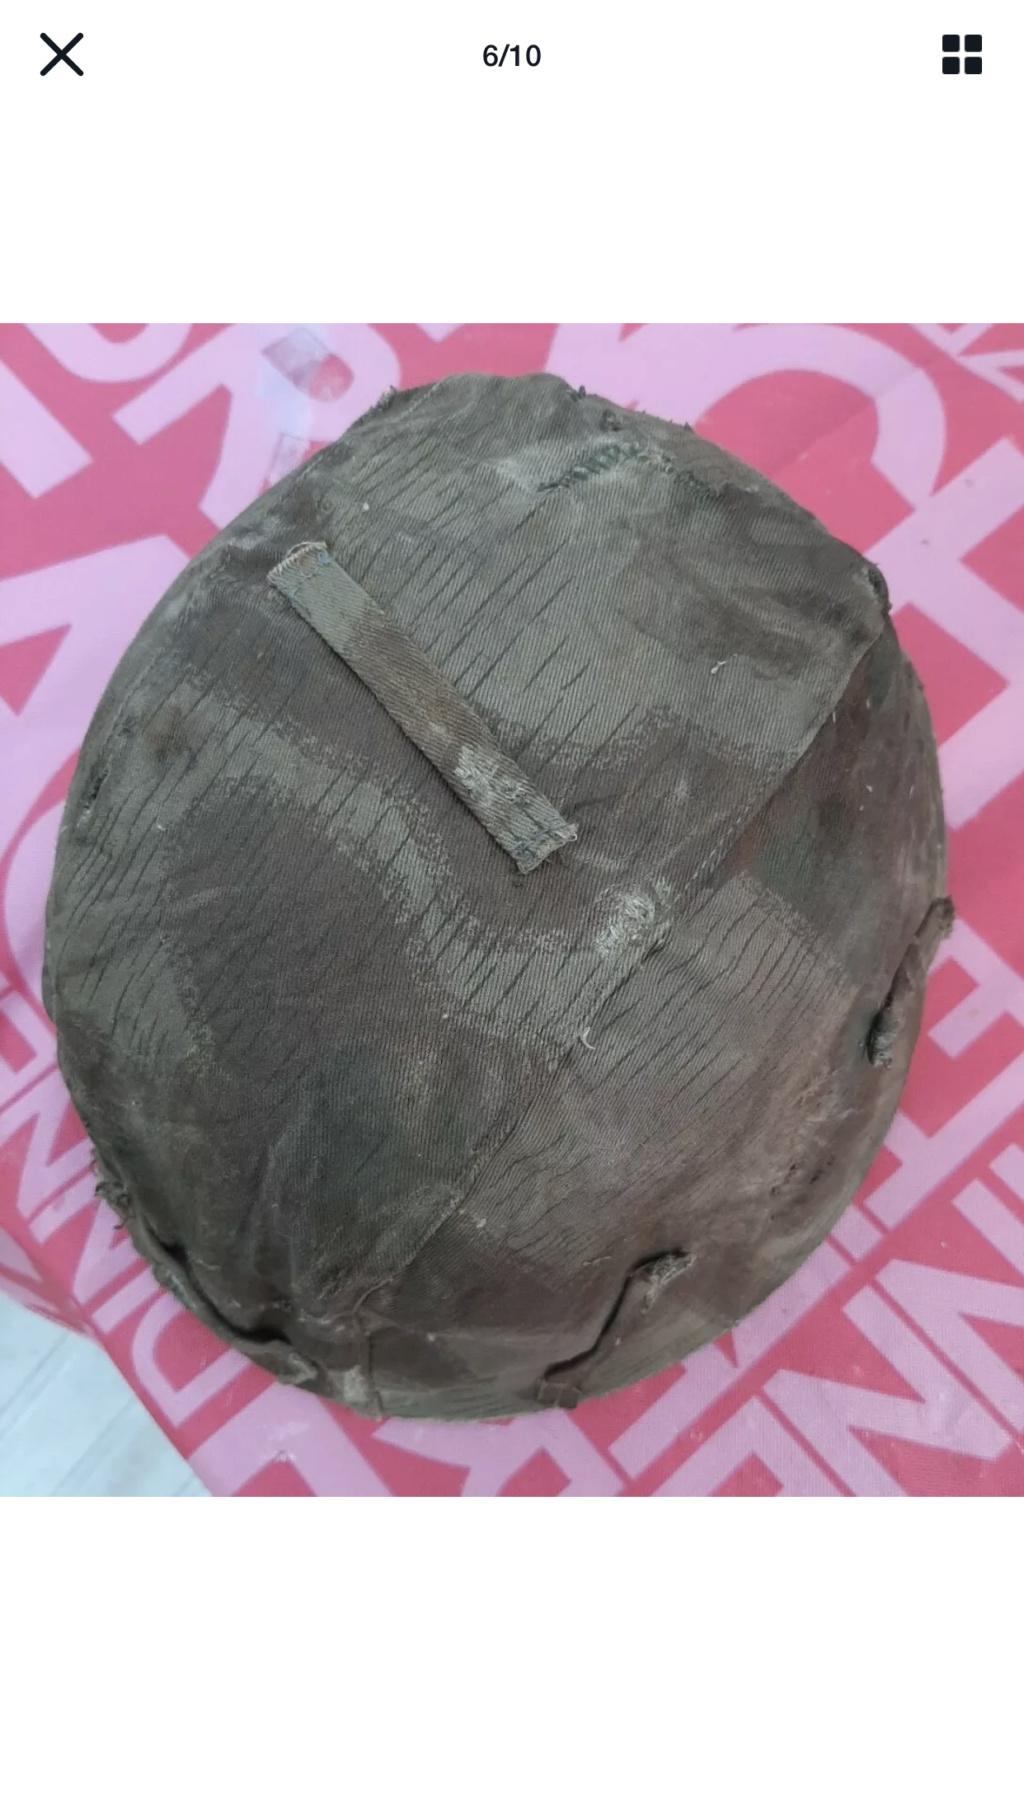 Couvre casque  77ce0310